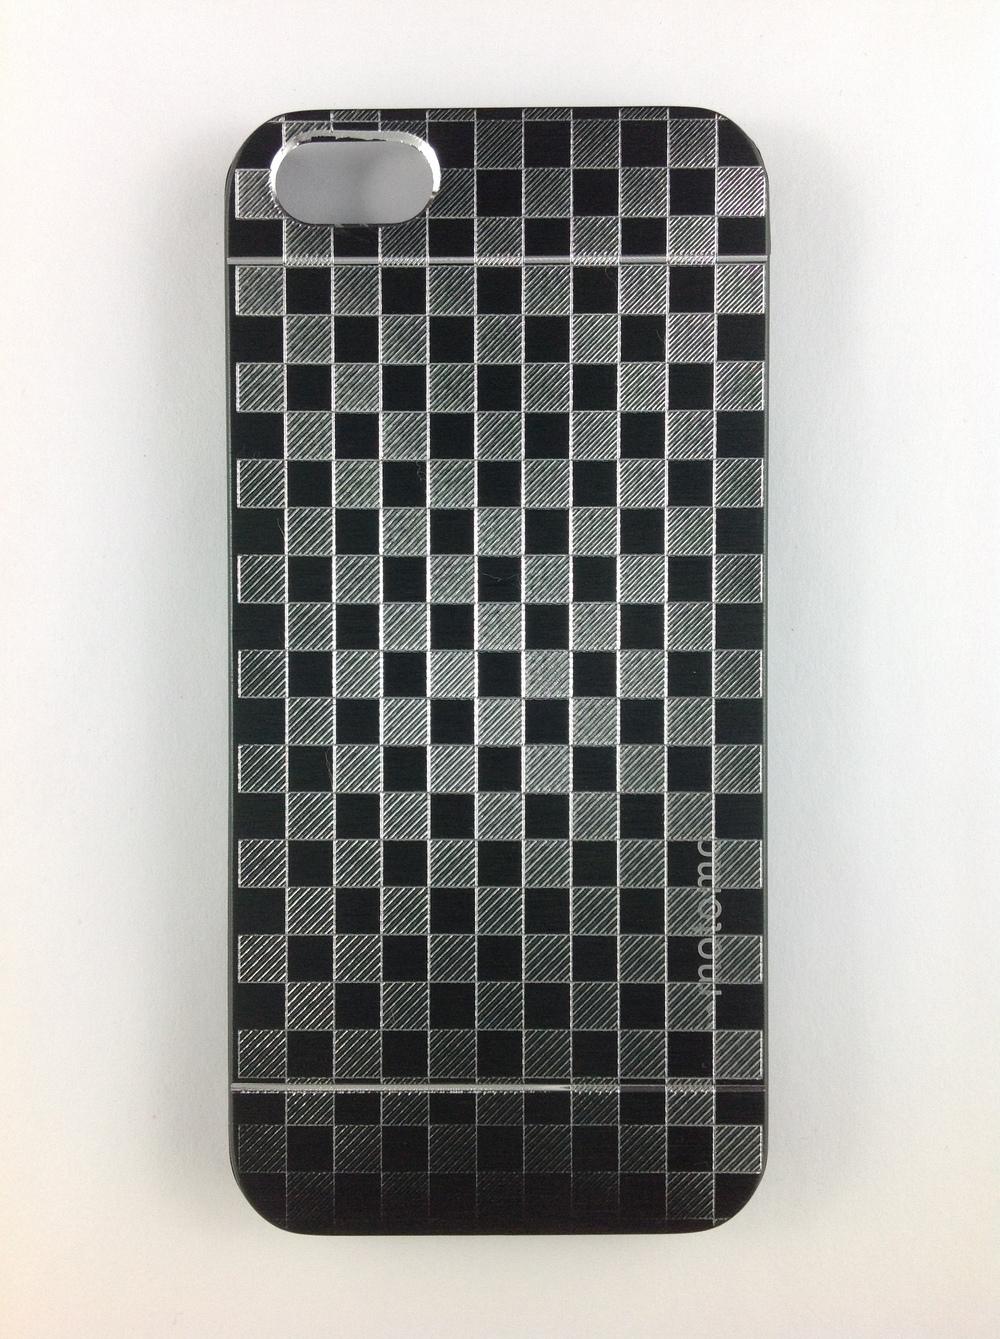 DigitalCarver-iPhone5s-IMG_3692.JPG